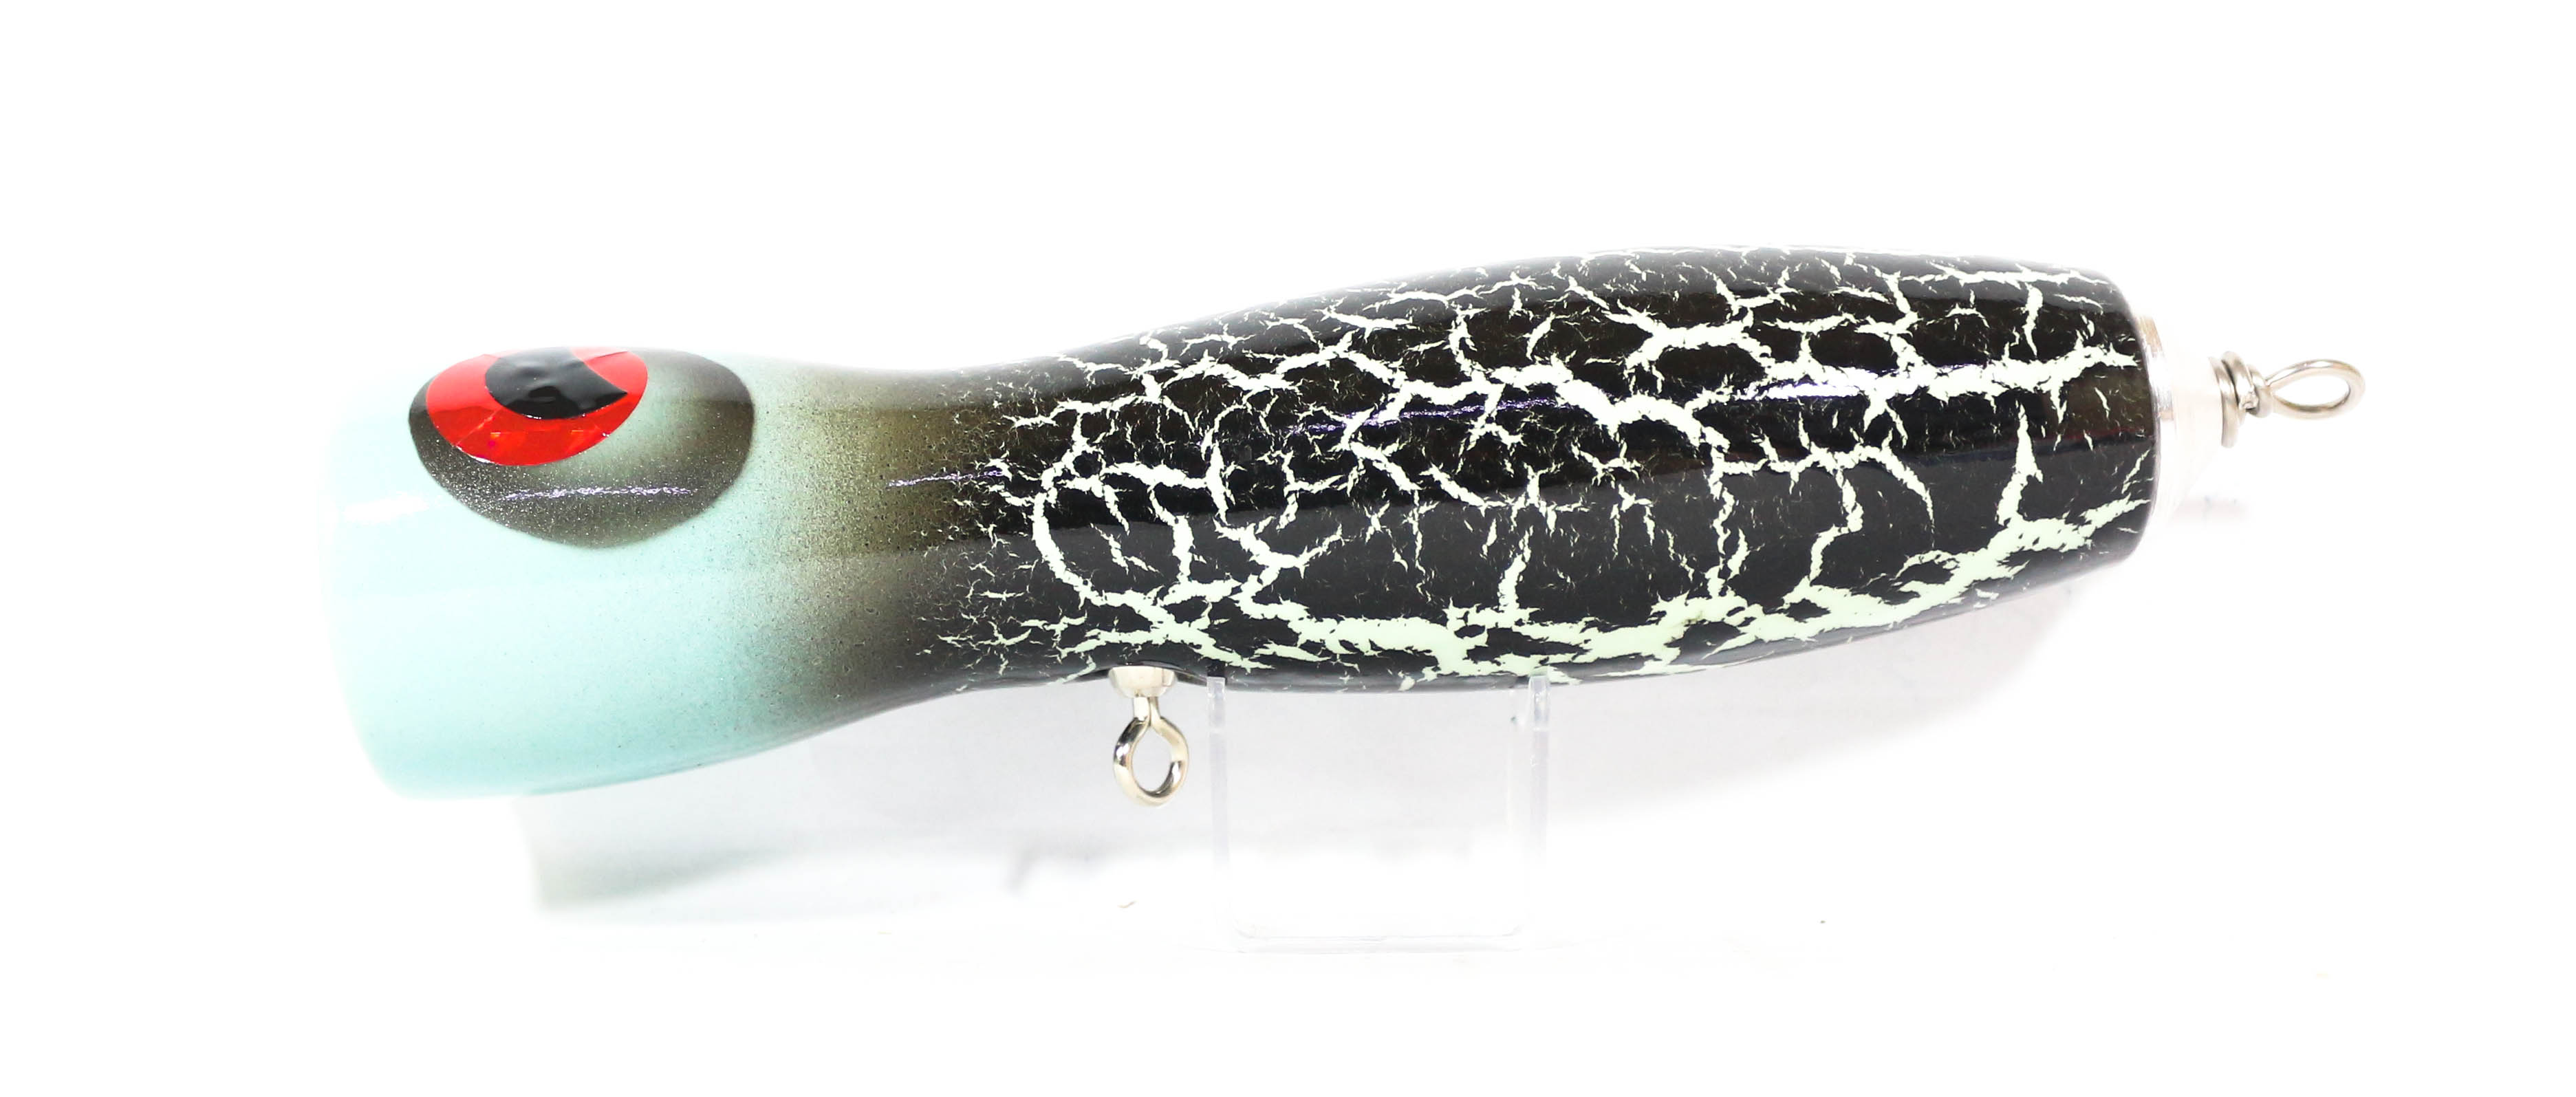 Handmade Popper Glowing Crack Floating 190 mm 130 grams Blue Head (1006)